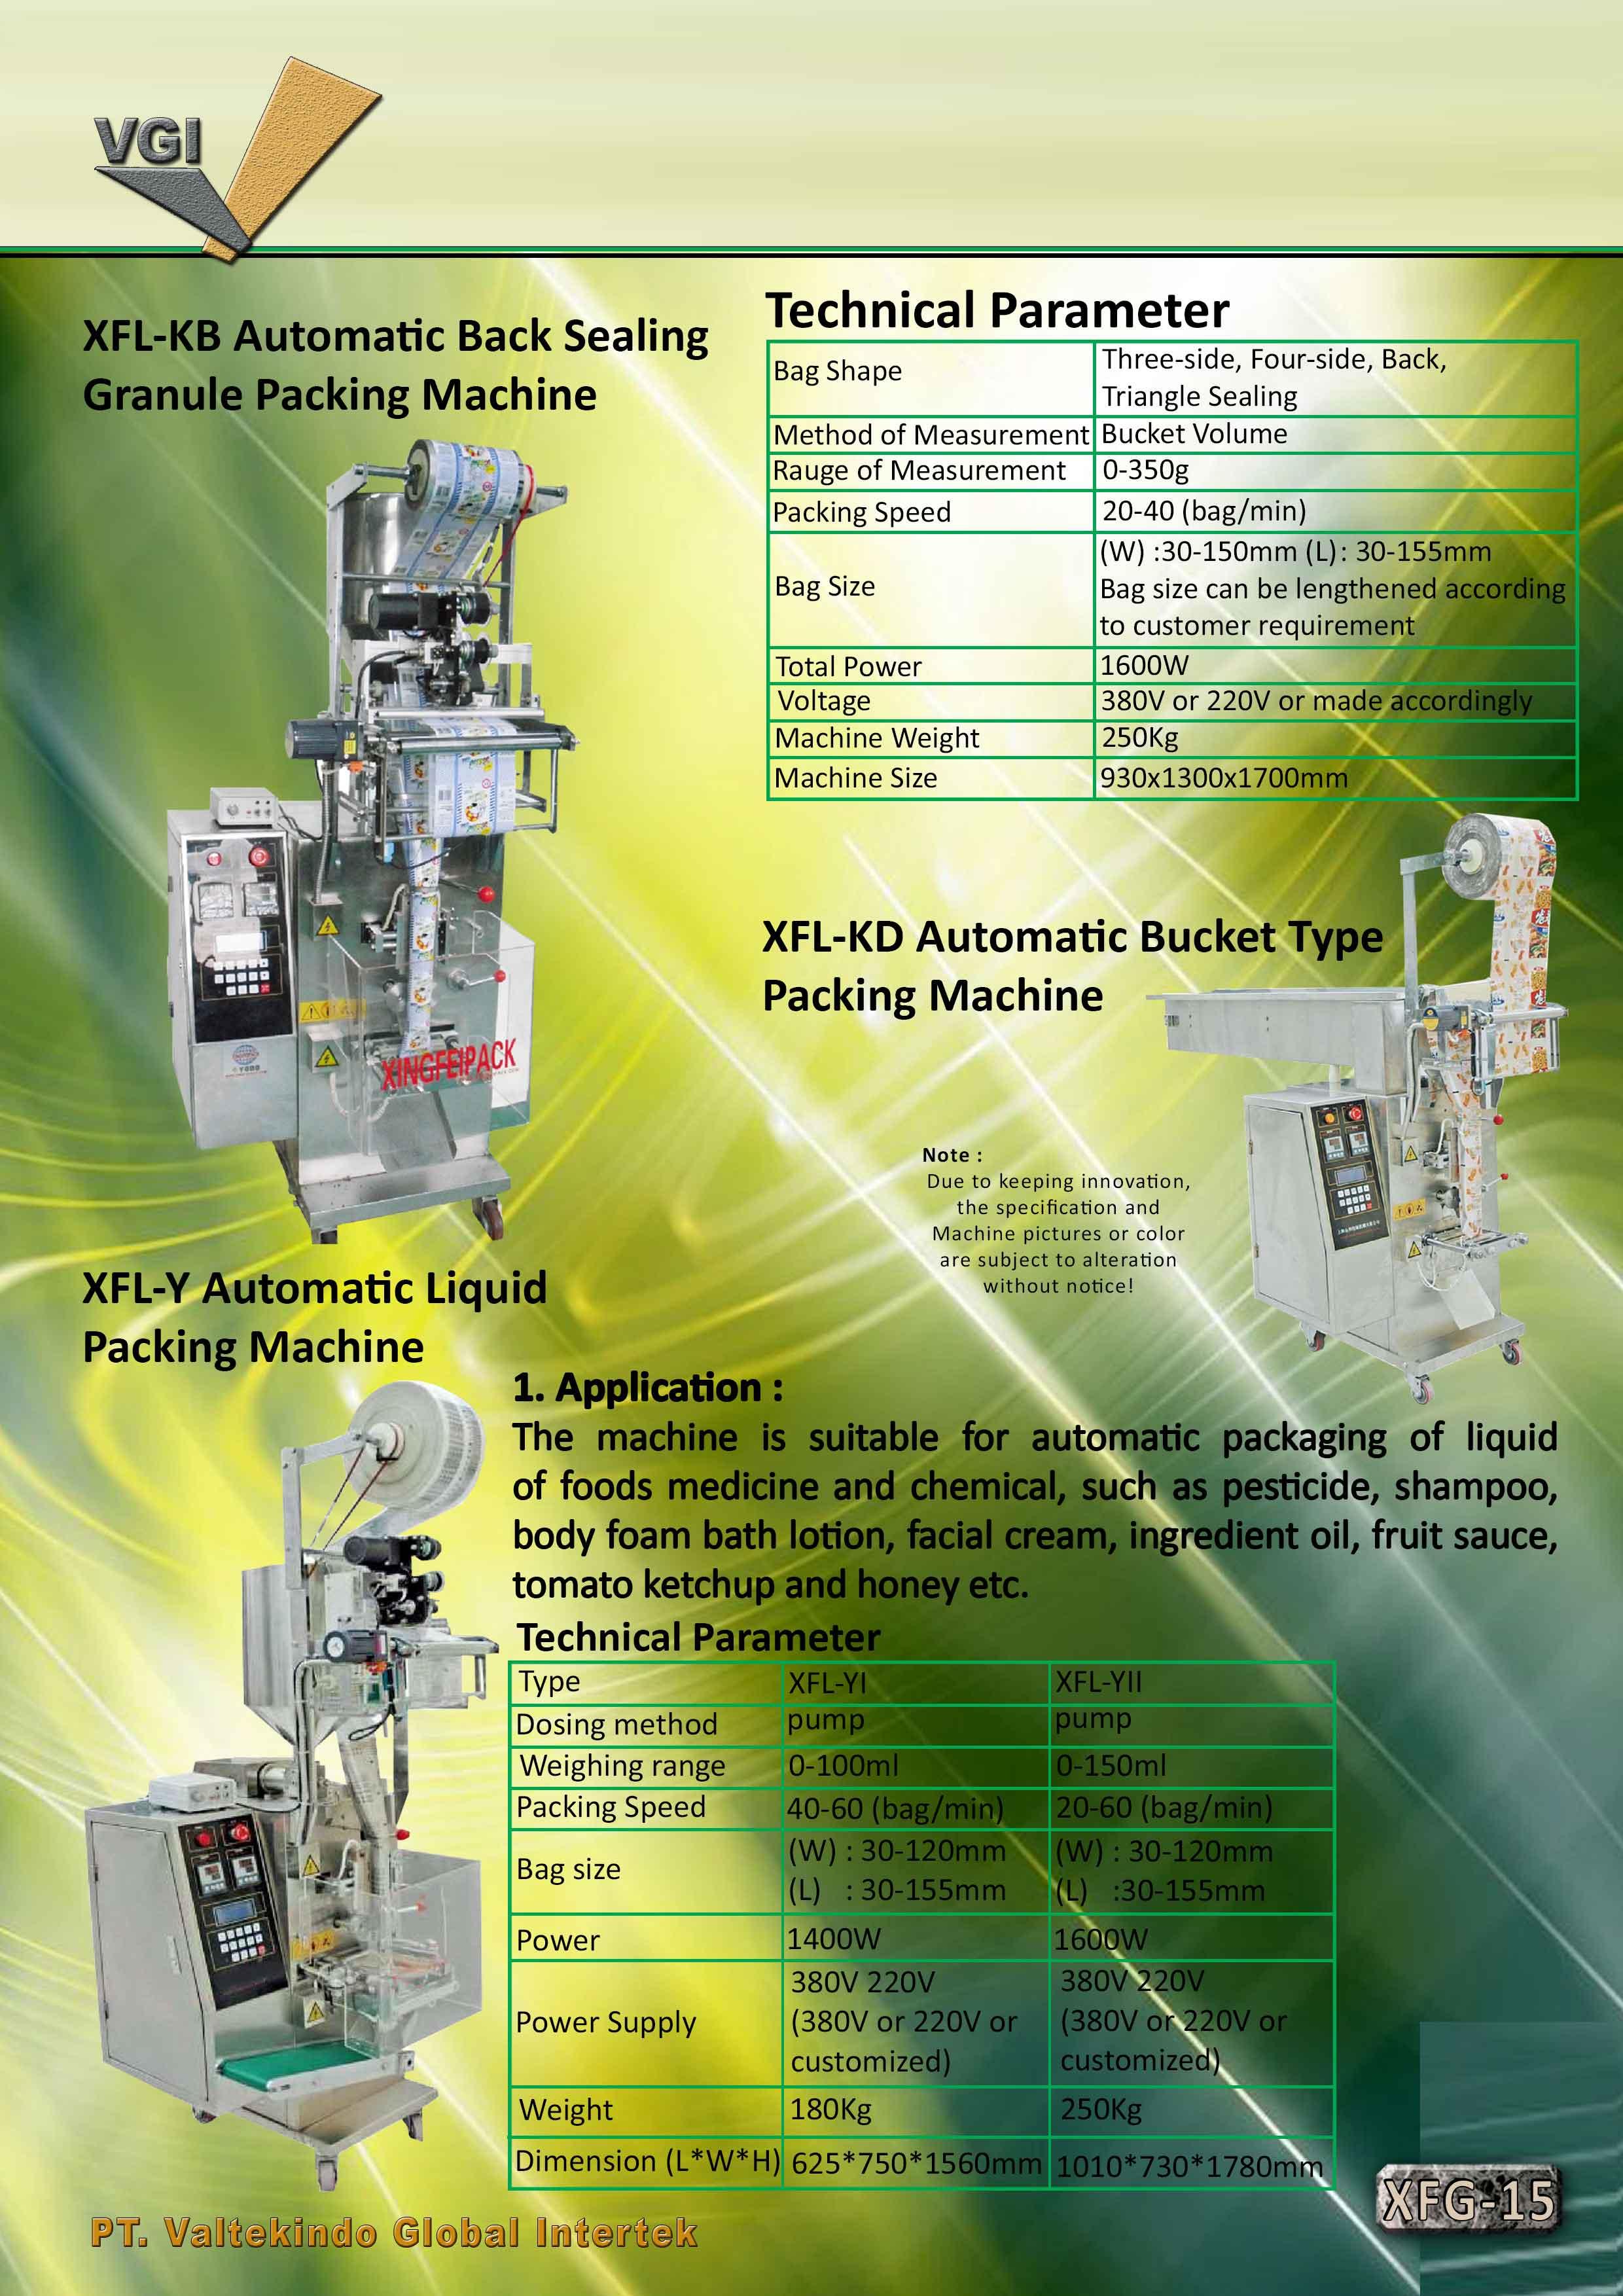 jual mesin Automatic Back Sealing Granule Packing Automatic Back Sealing Granule Packing